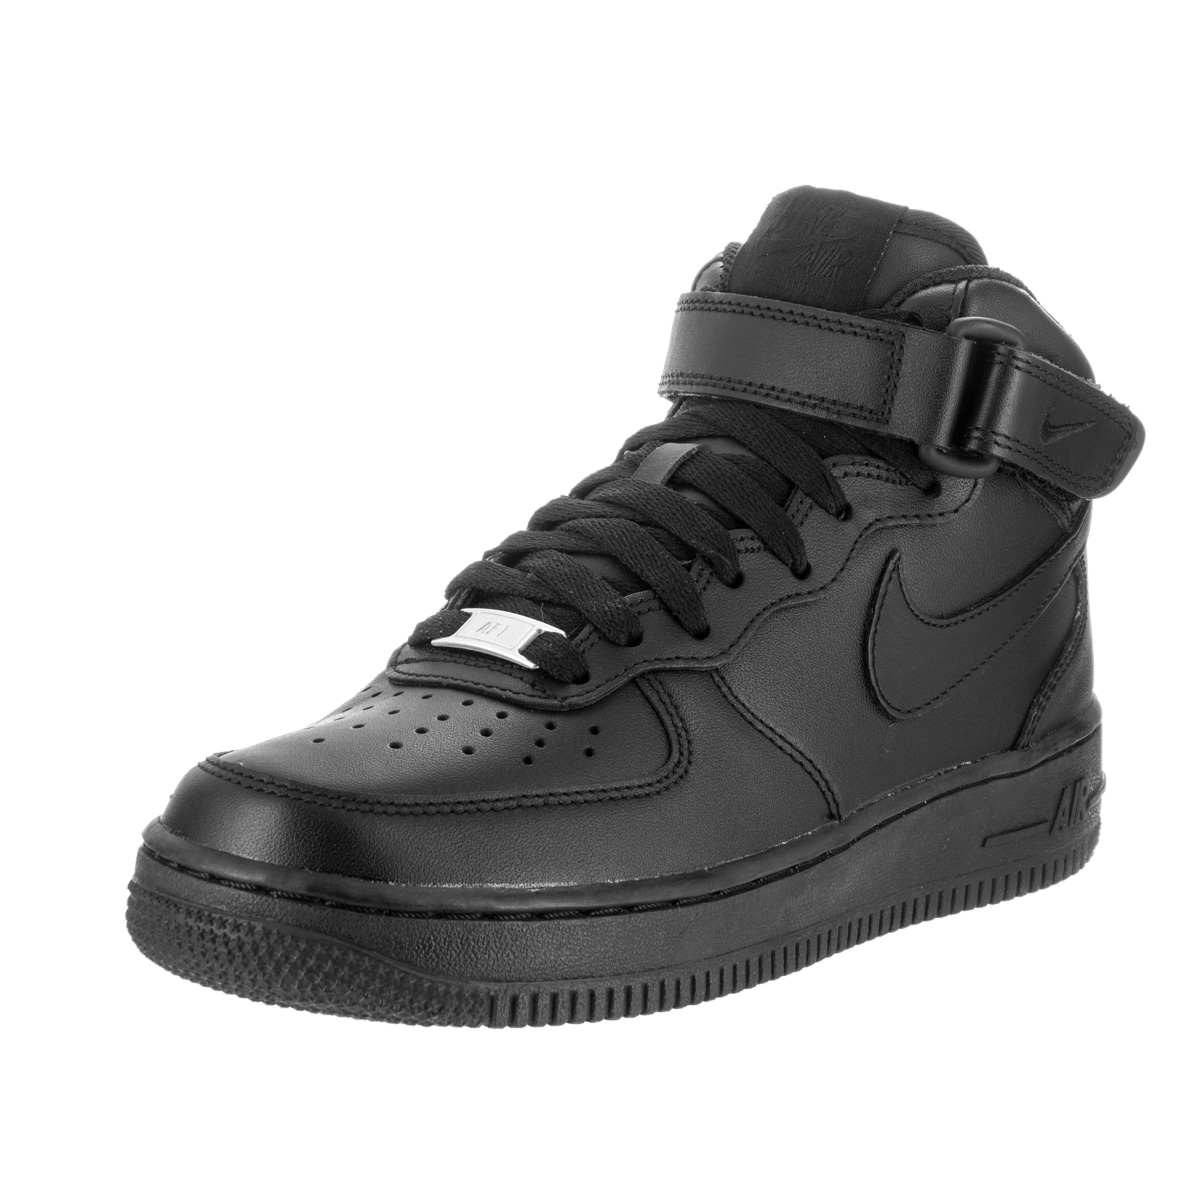 Nike Women's Air Force 1 Black Leather Basketball Shoe (9)